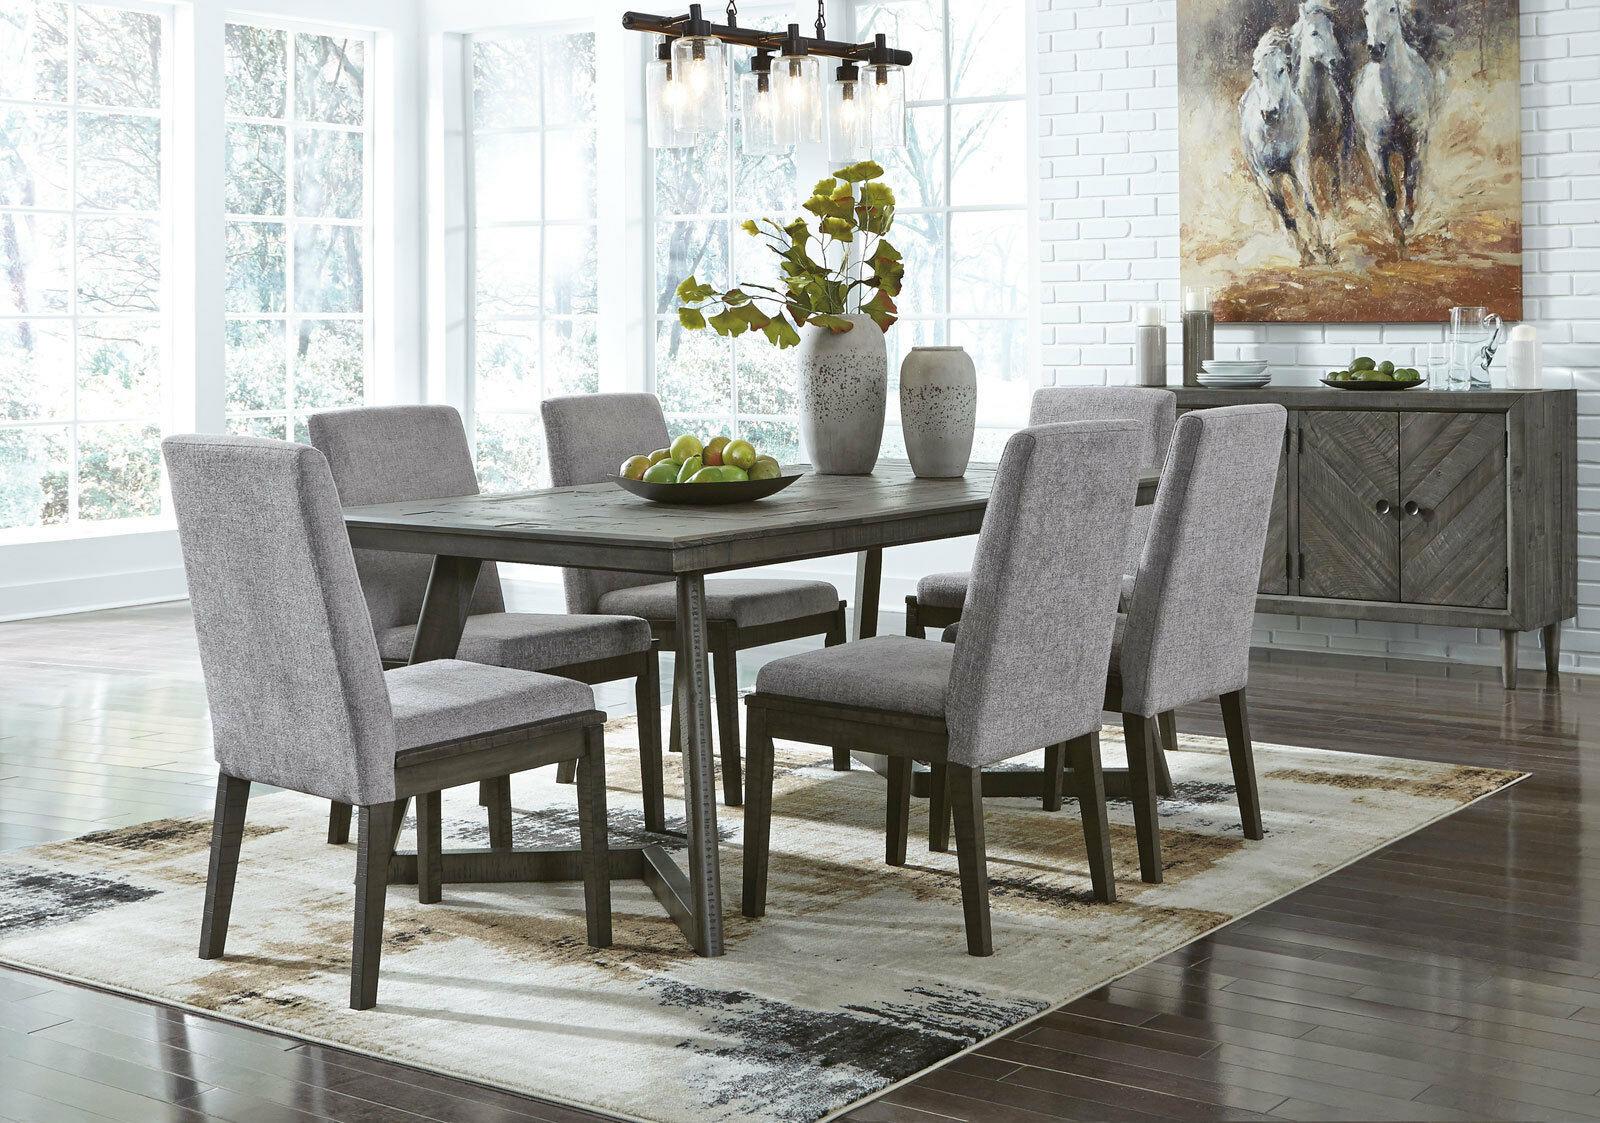 new modern pine gray finish dining room rectangular table